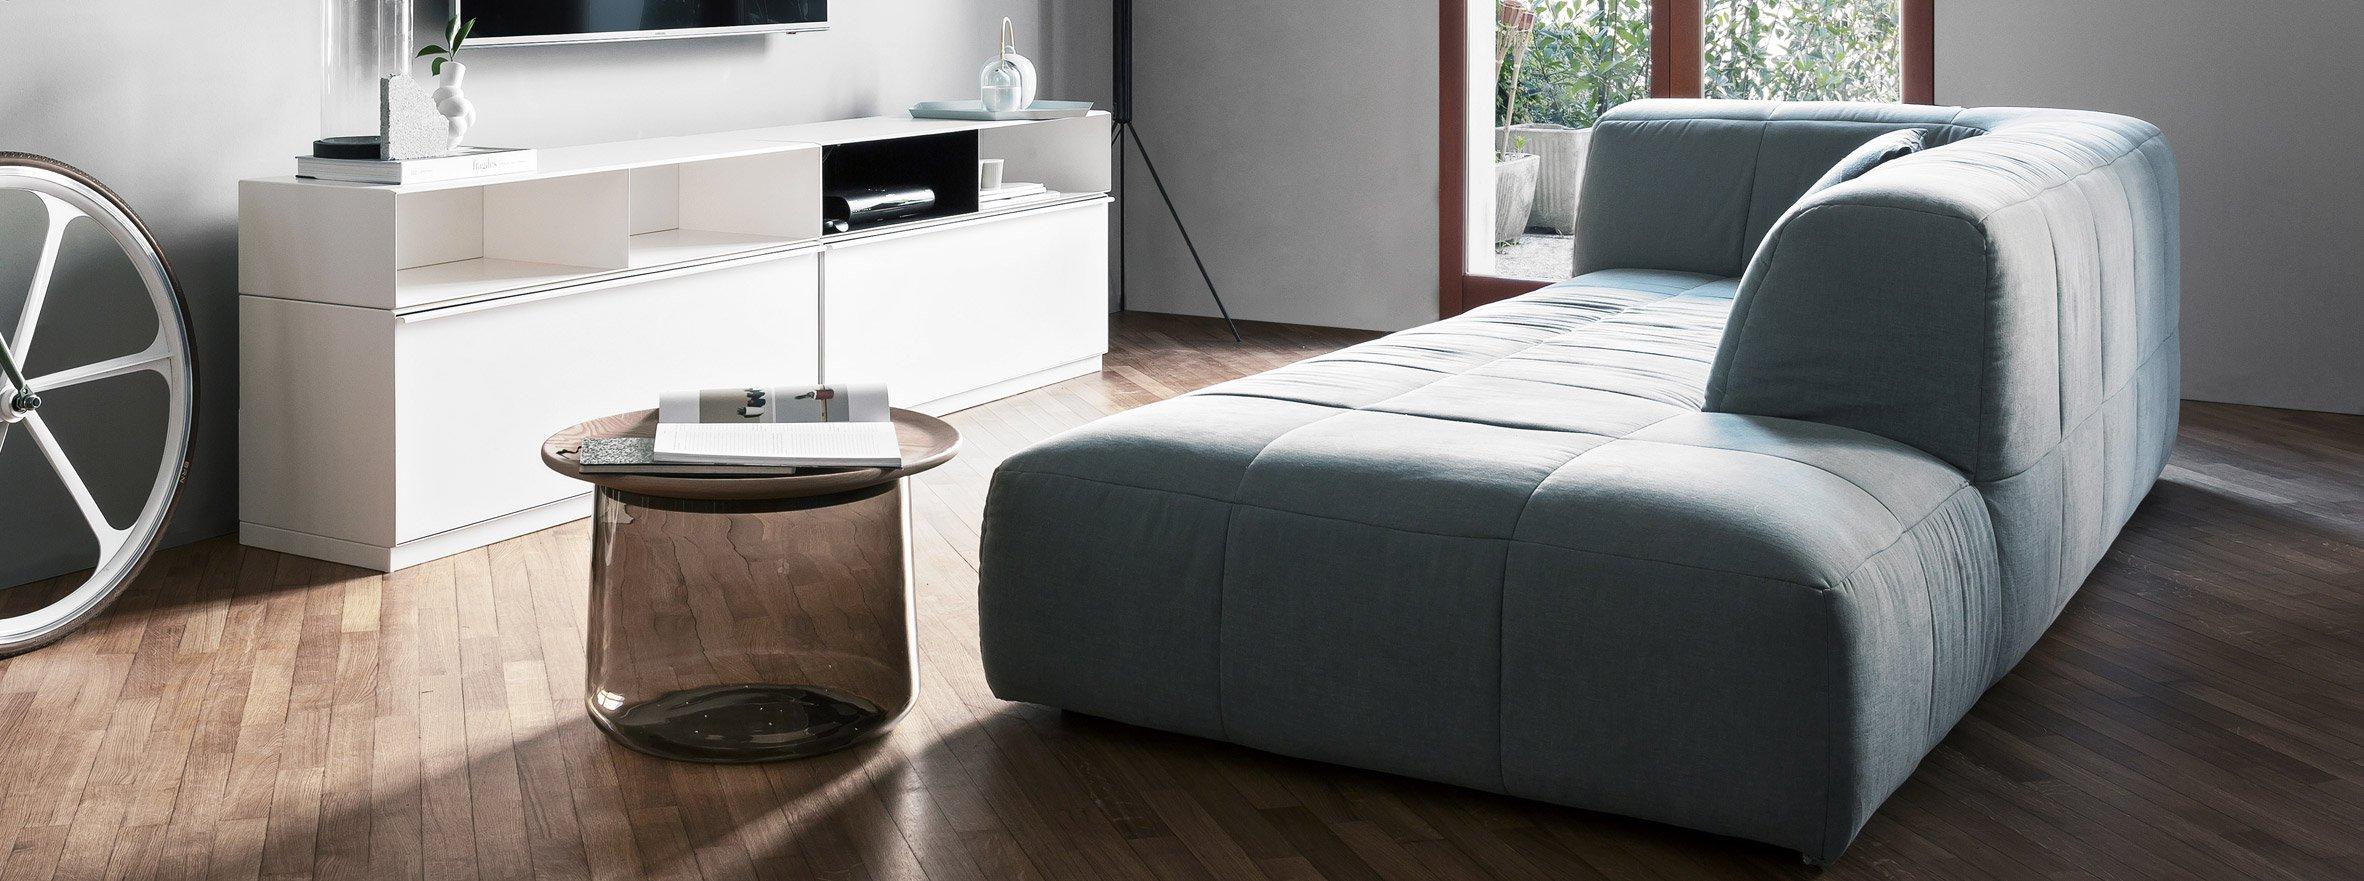 architecture-house-residential-design-studia-interiors-osnovadesign-osnova-poltava_15